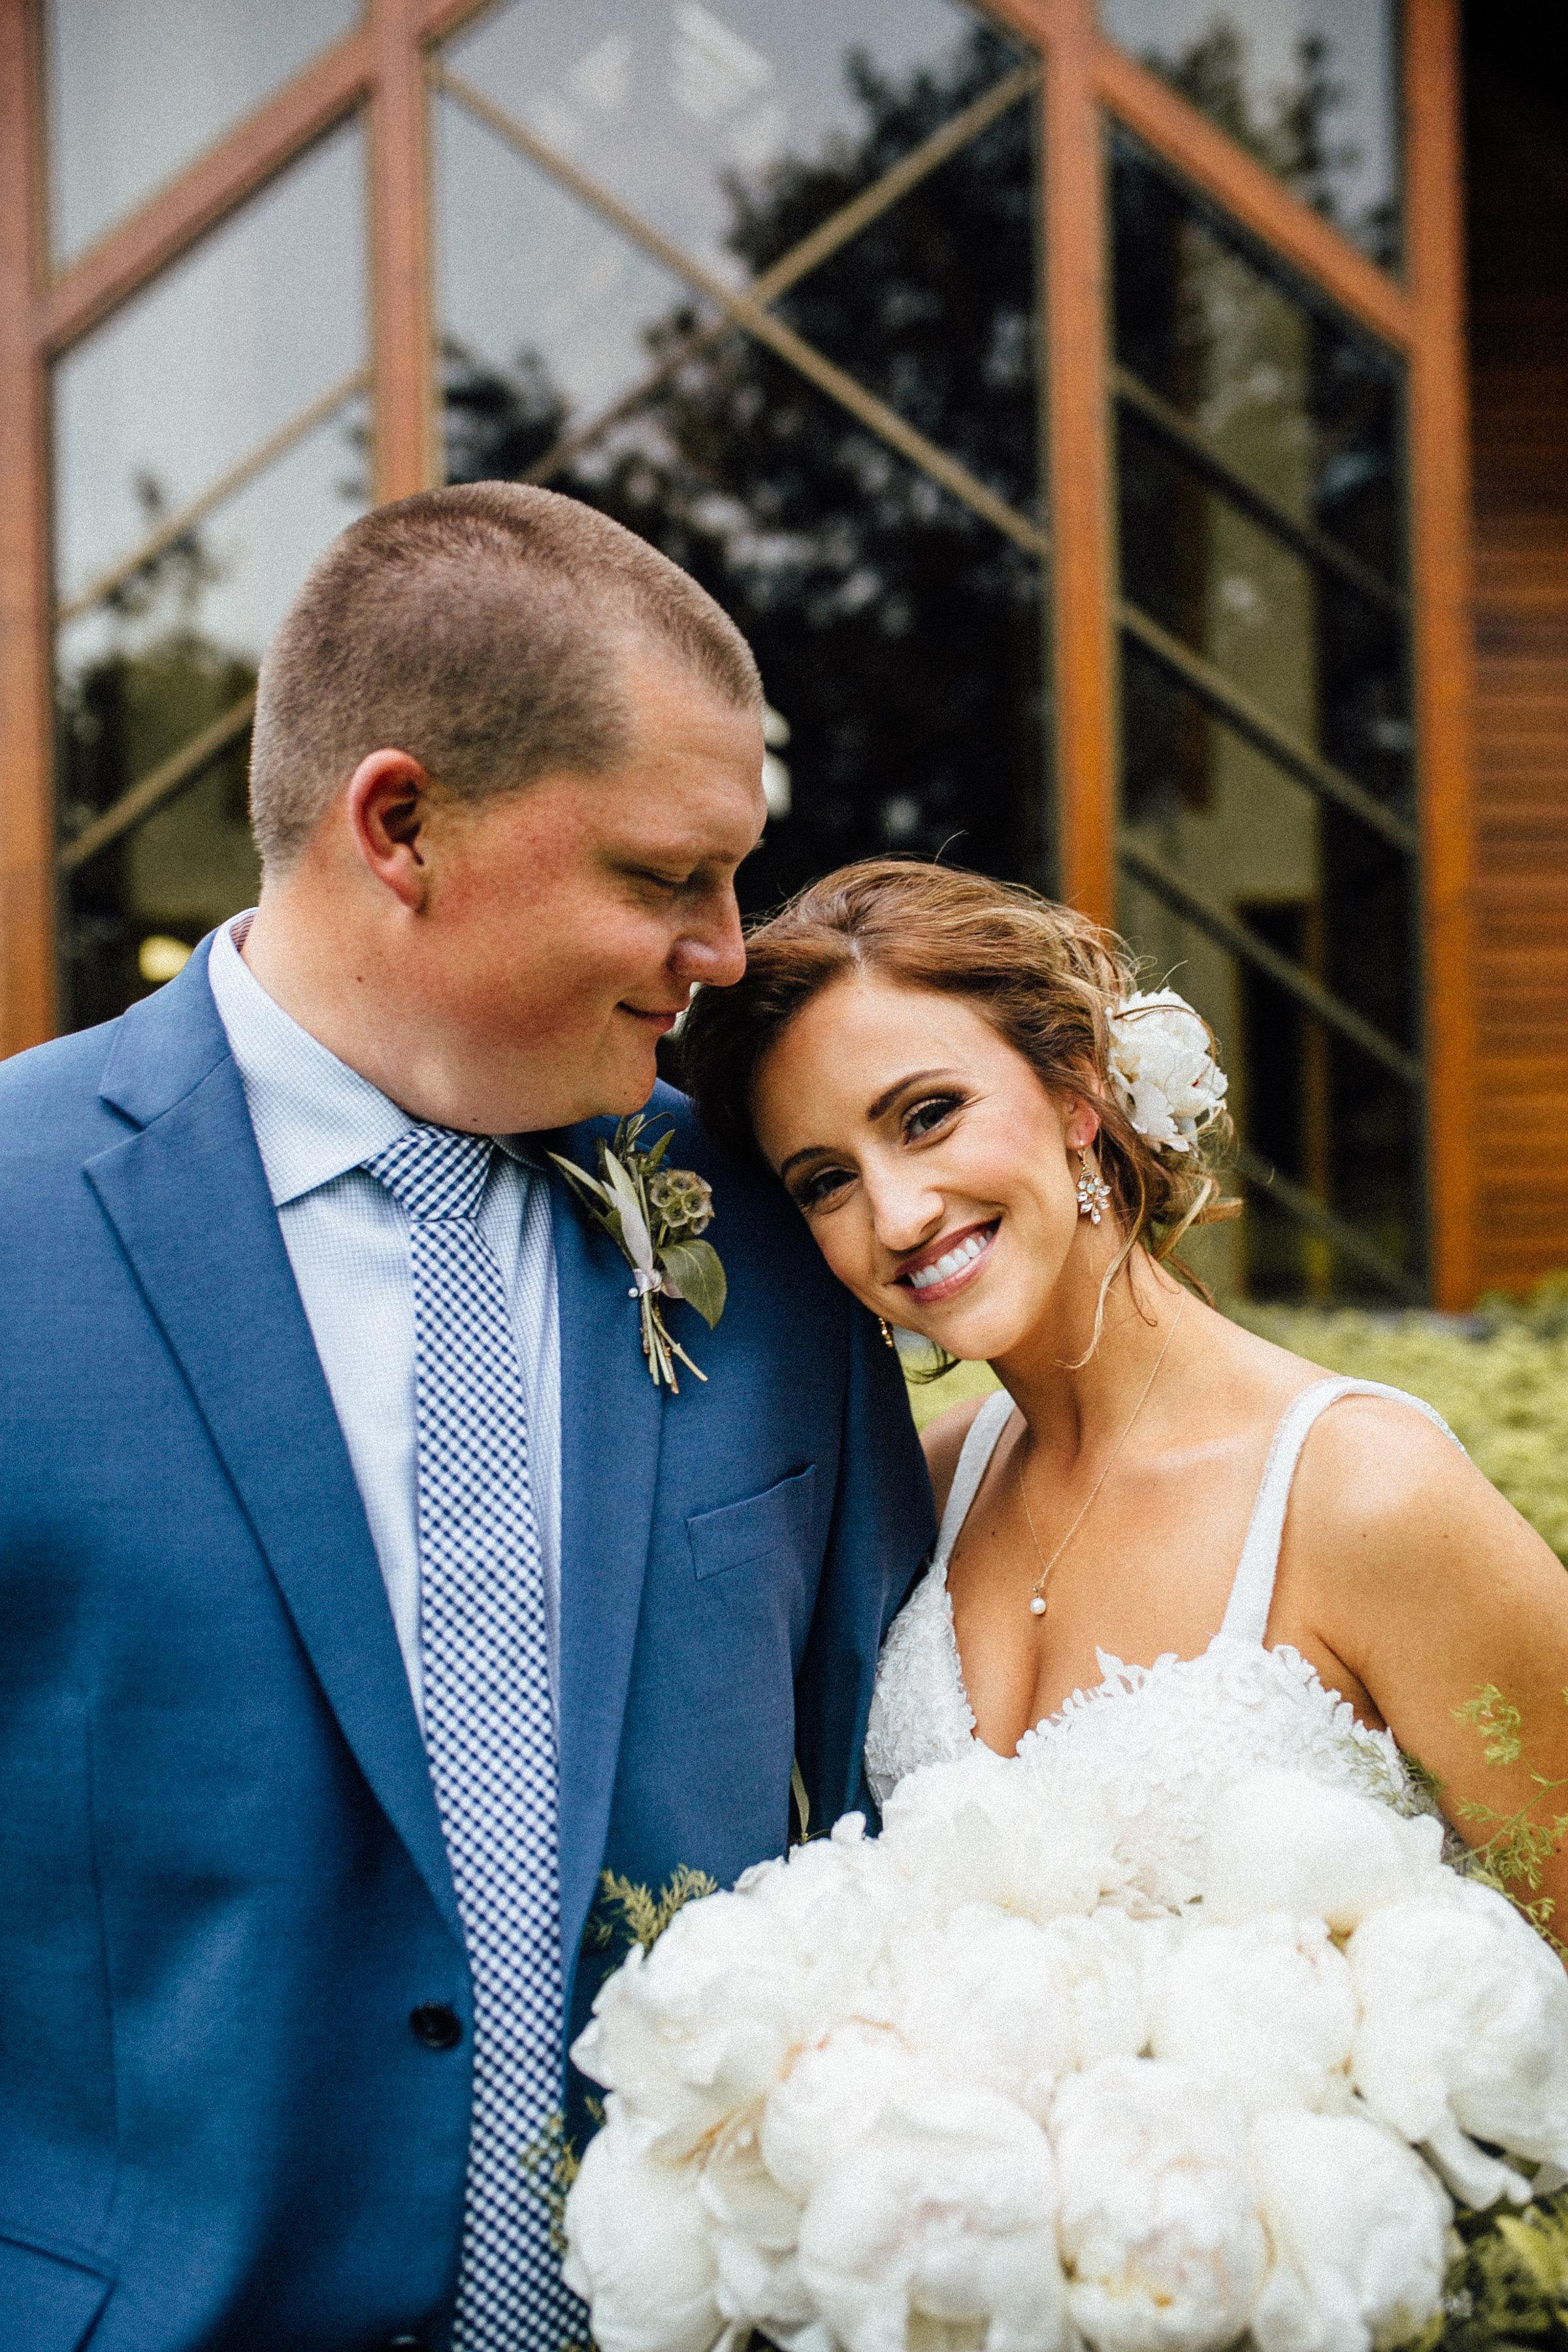 Whitney-Kevin-Portraits-Michigan-Wedding-Photographer-72.jpg